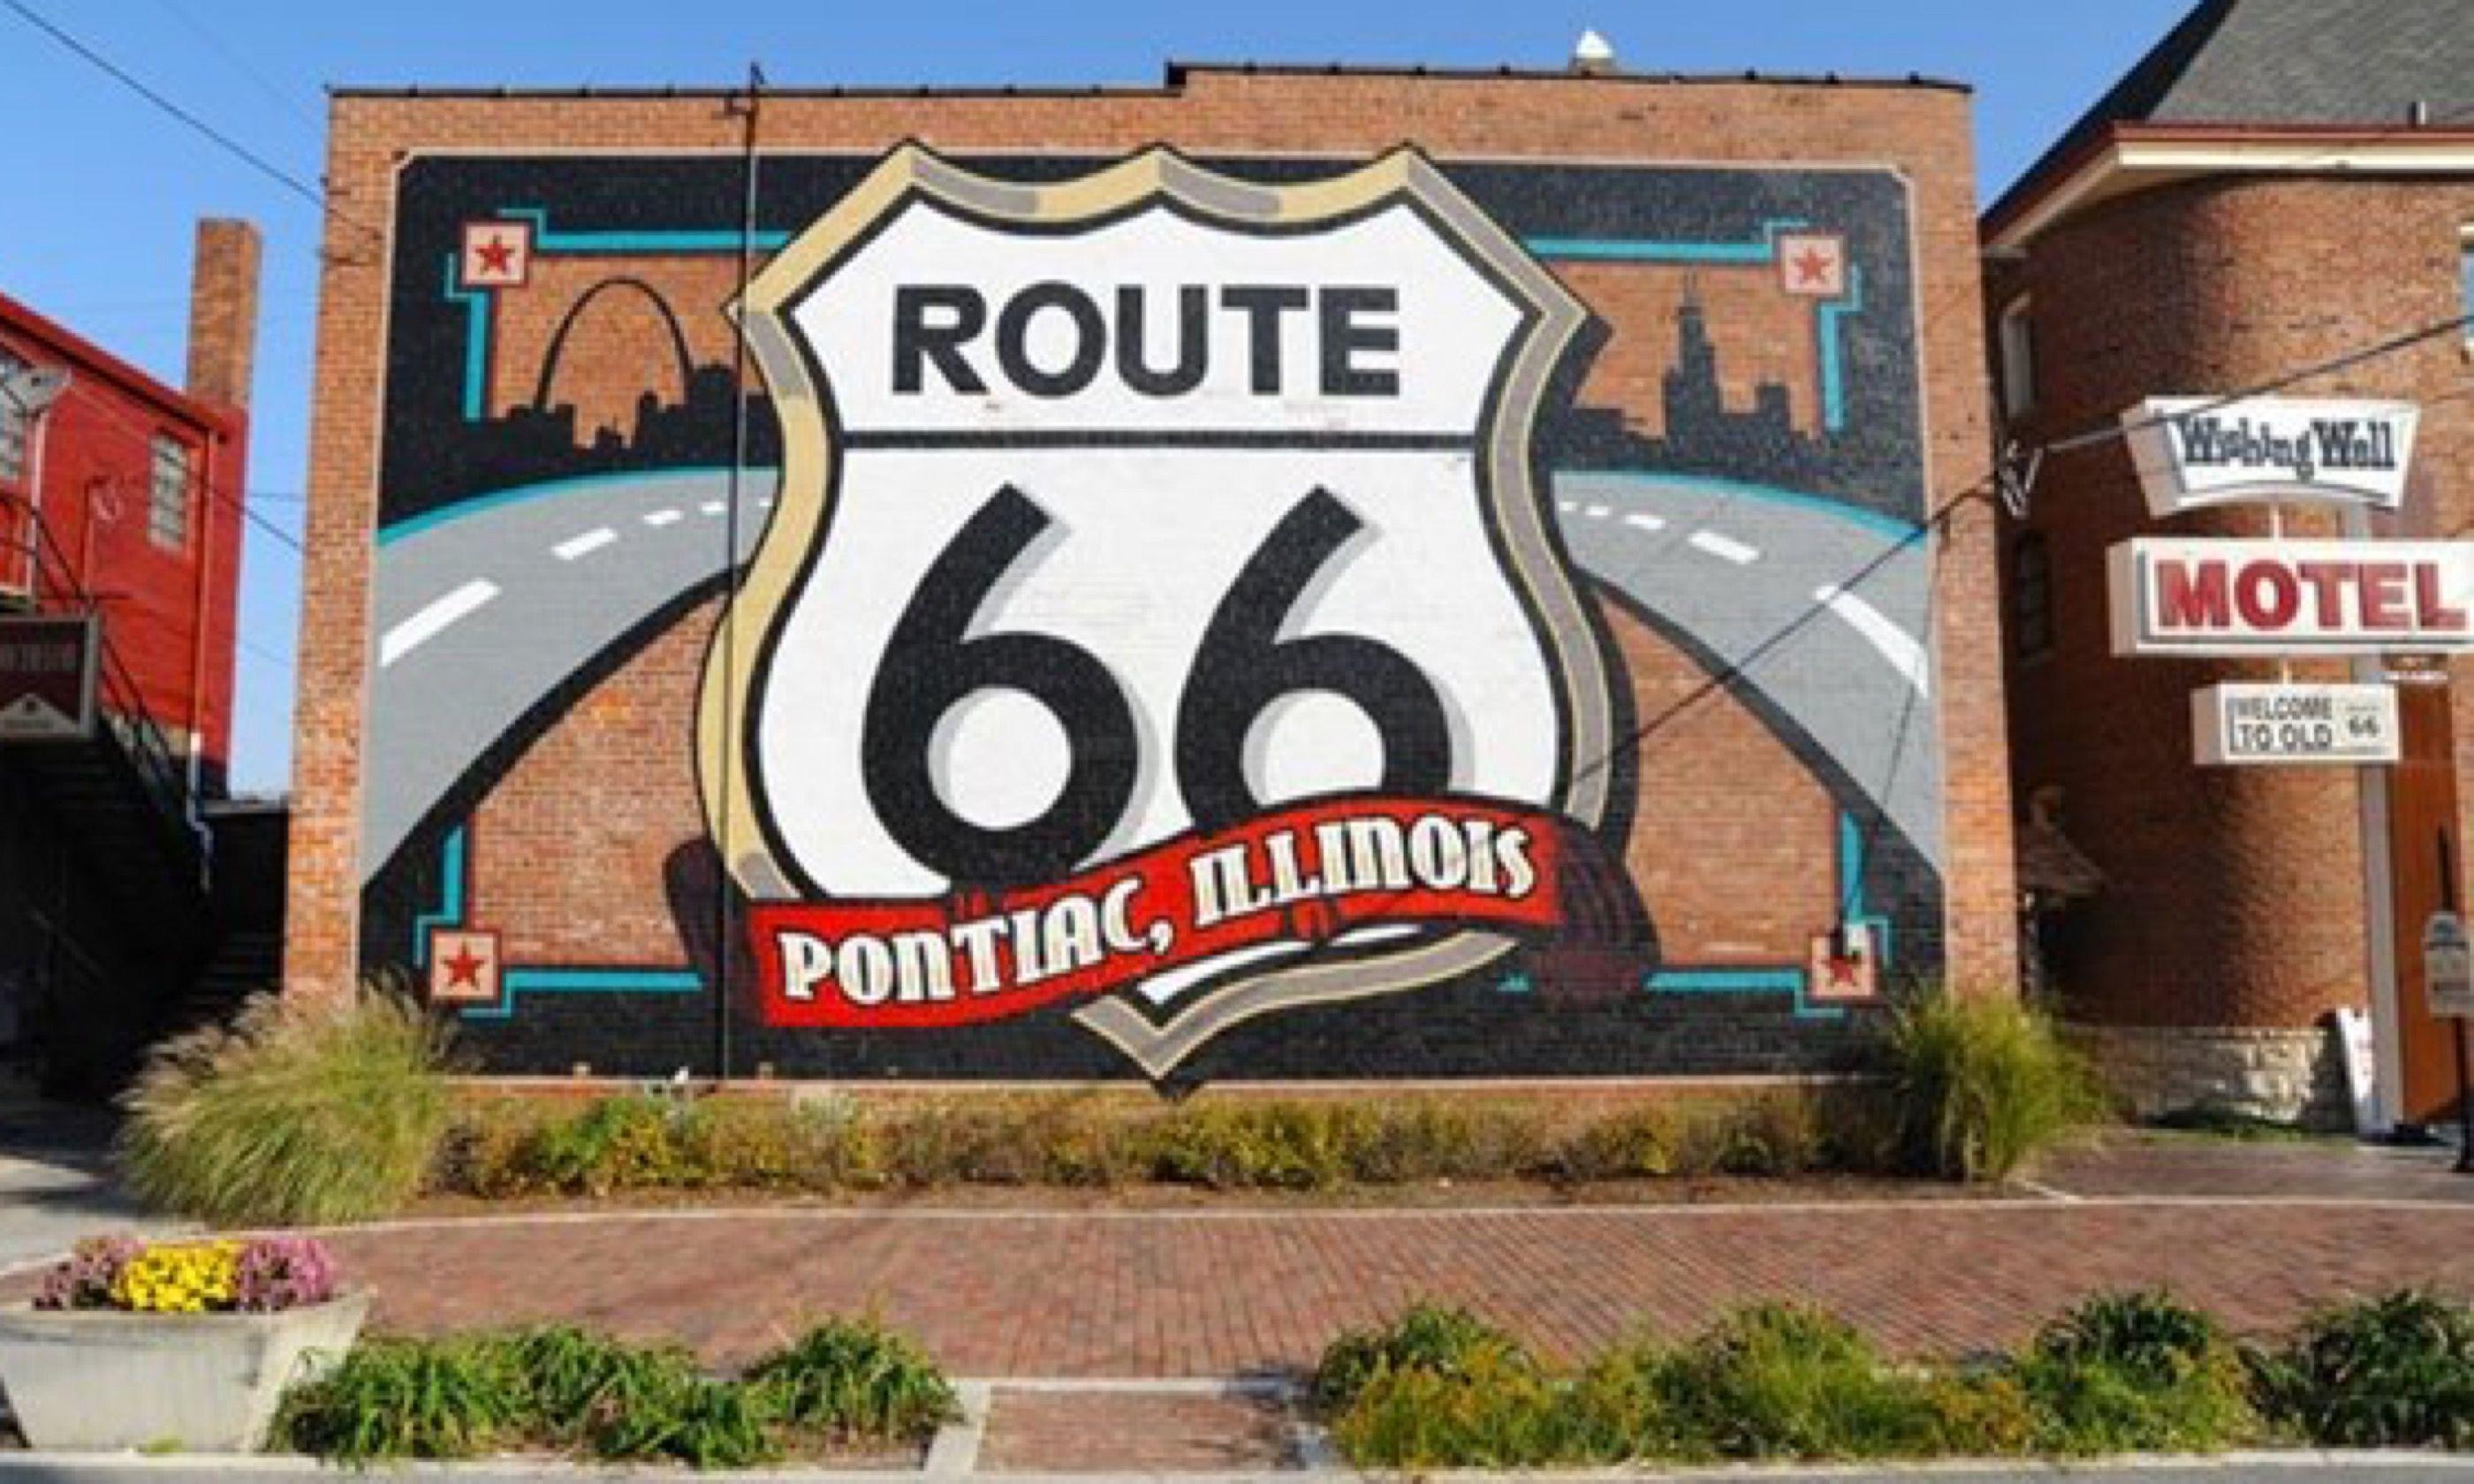 The world's largest Route 66 shield (www.enjoyillinois.com)